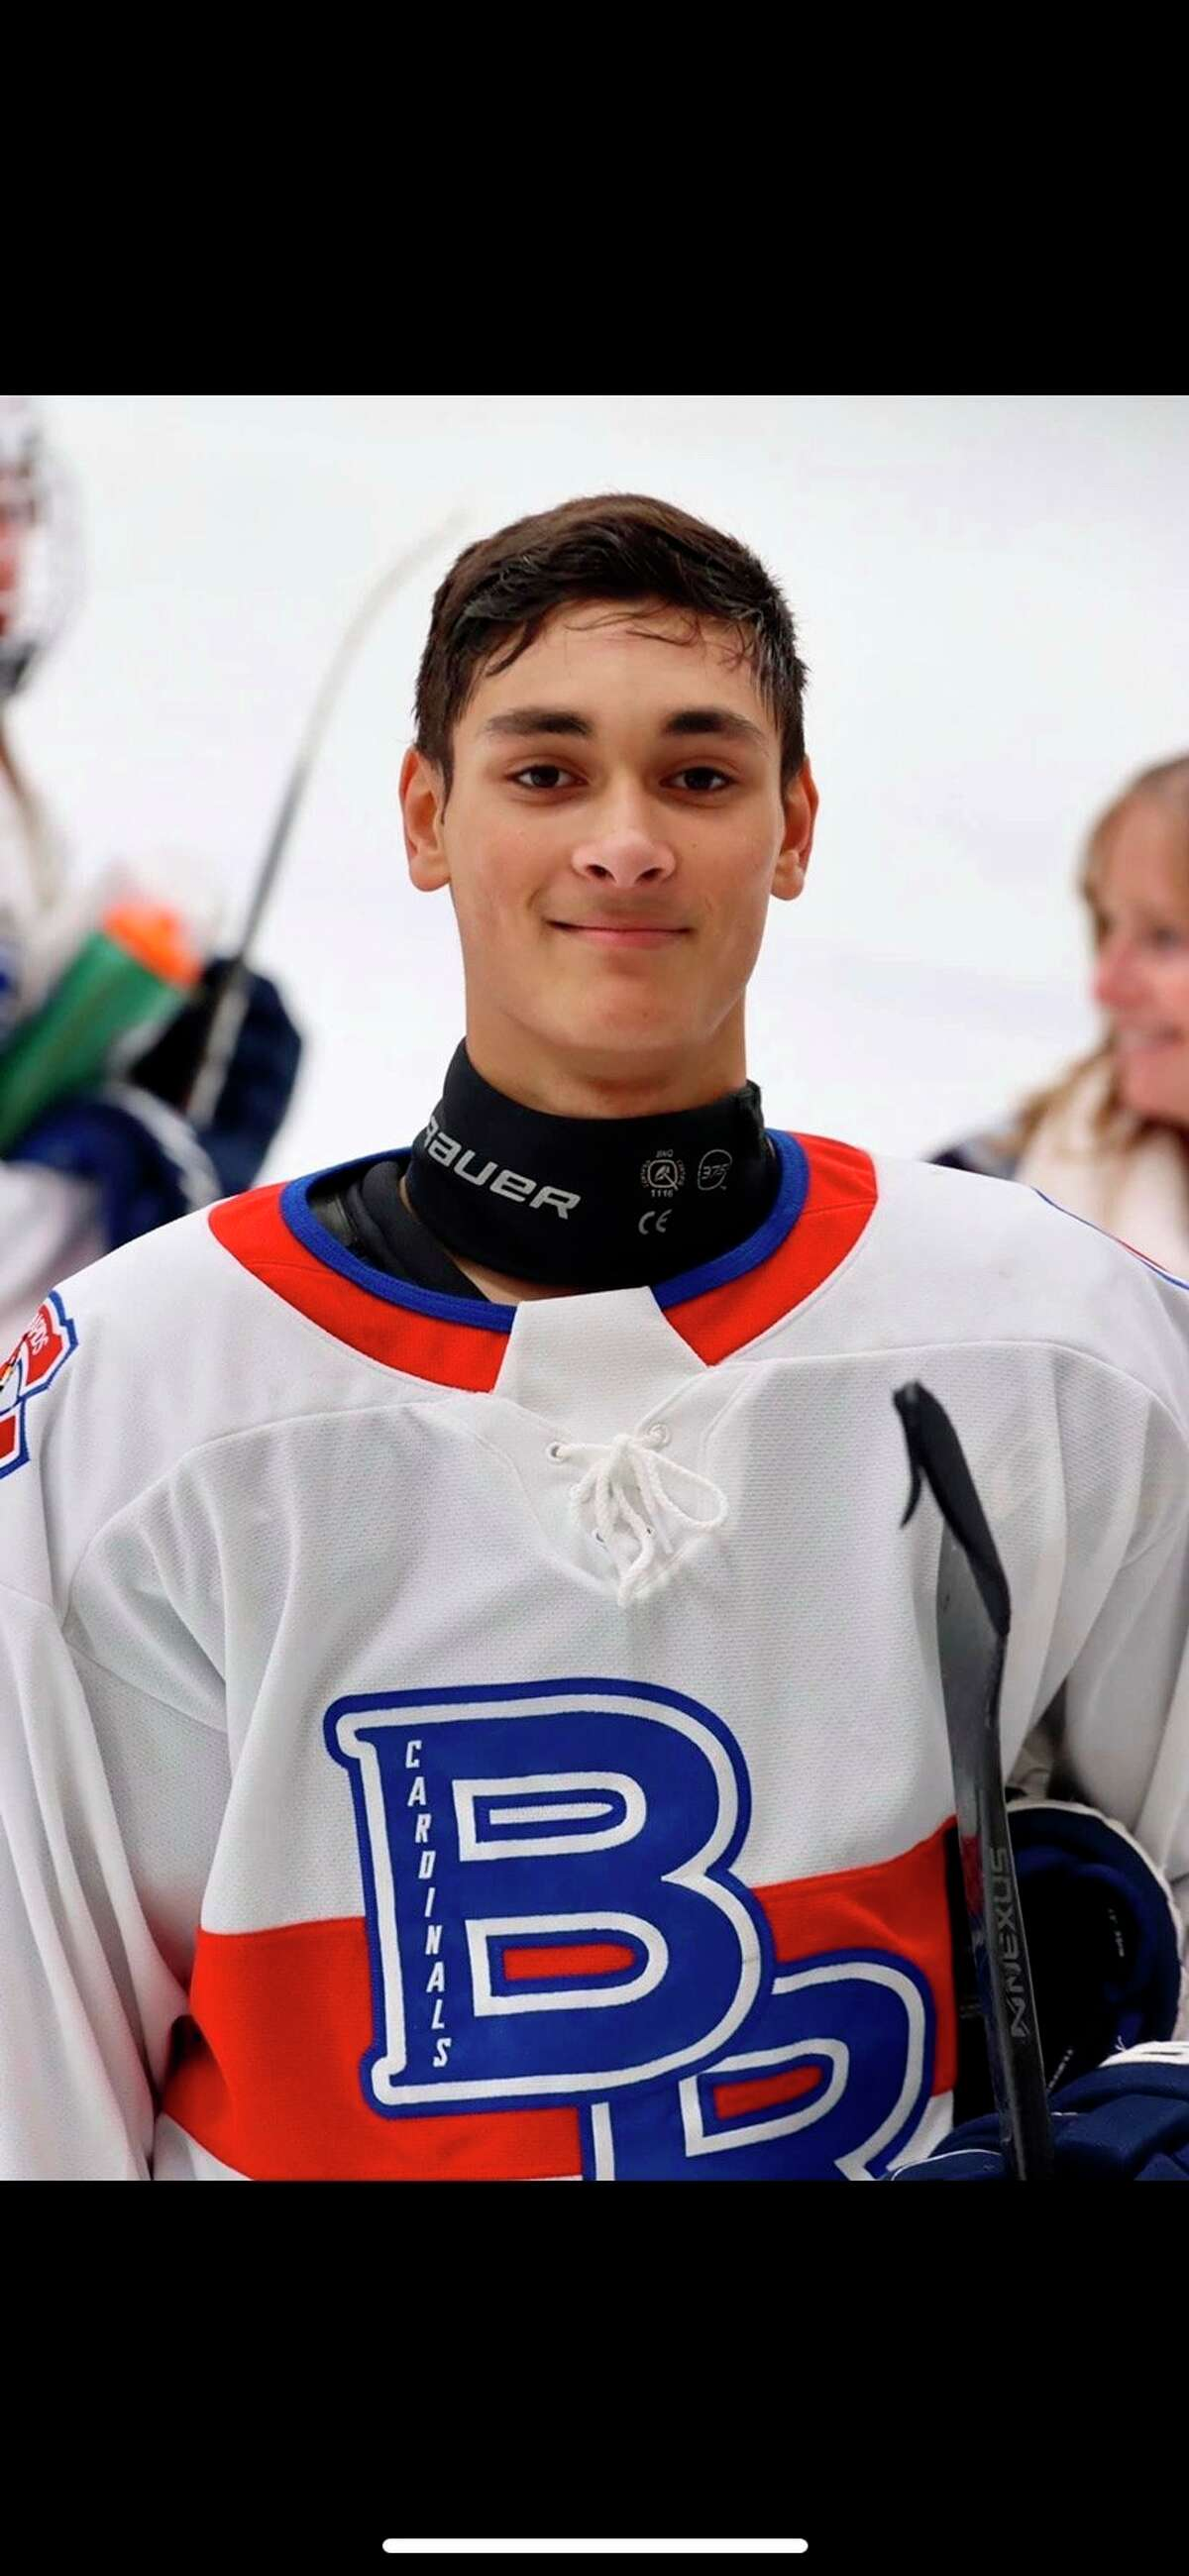 Thomas Holt is in his senior season for Big Rapids hockey team. (Courtesy photo)